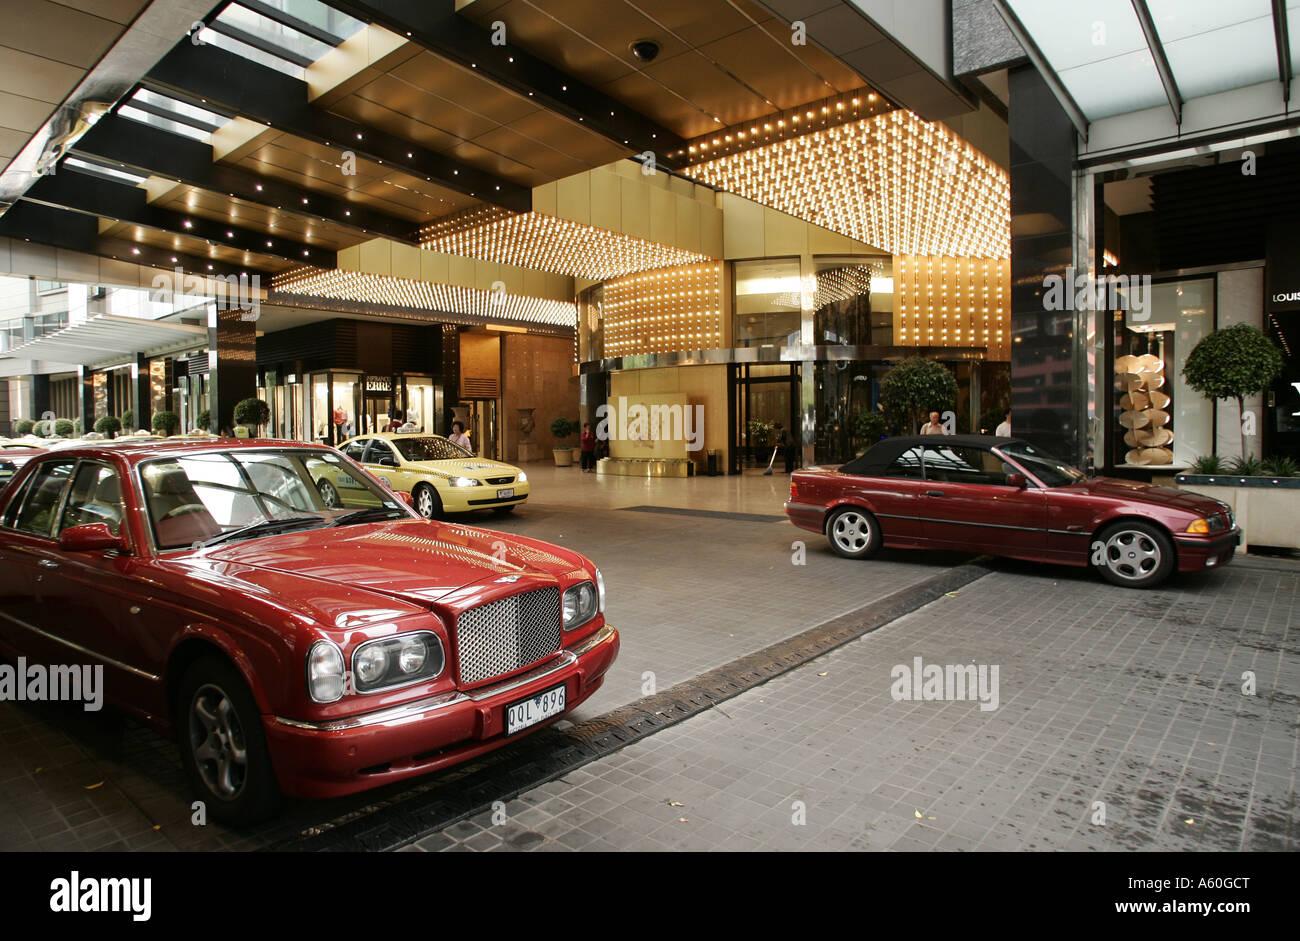 Crown casino parking saturday